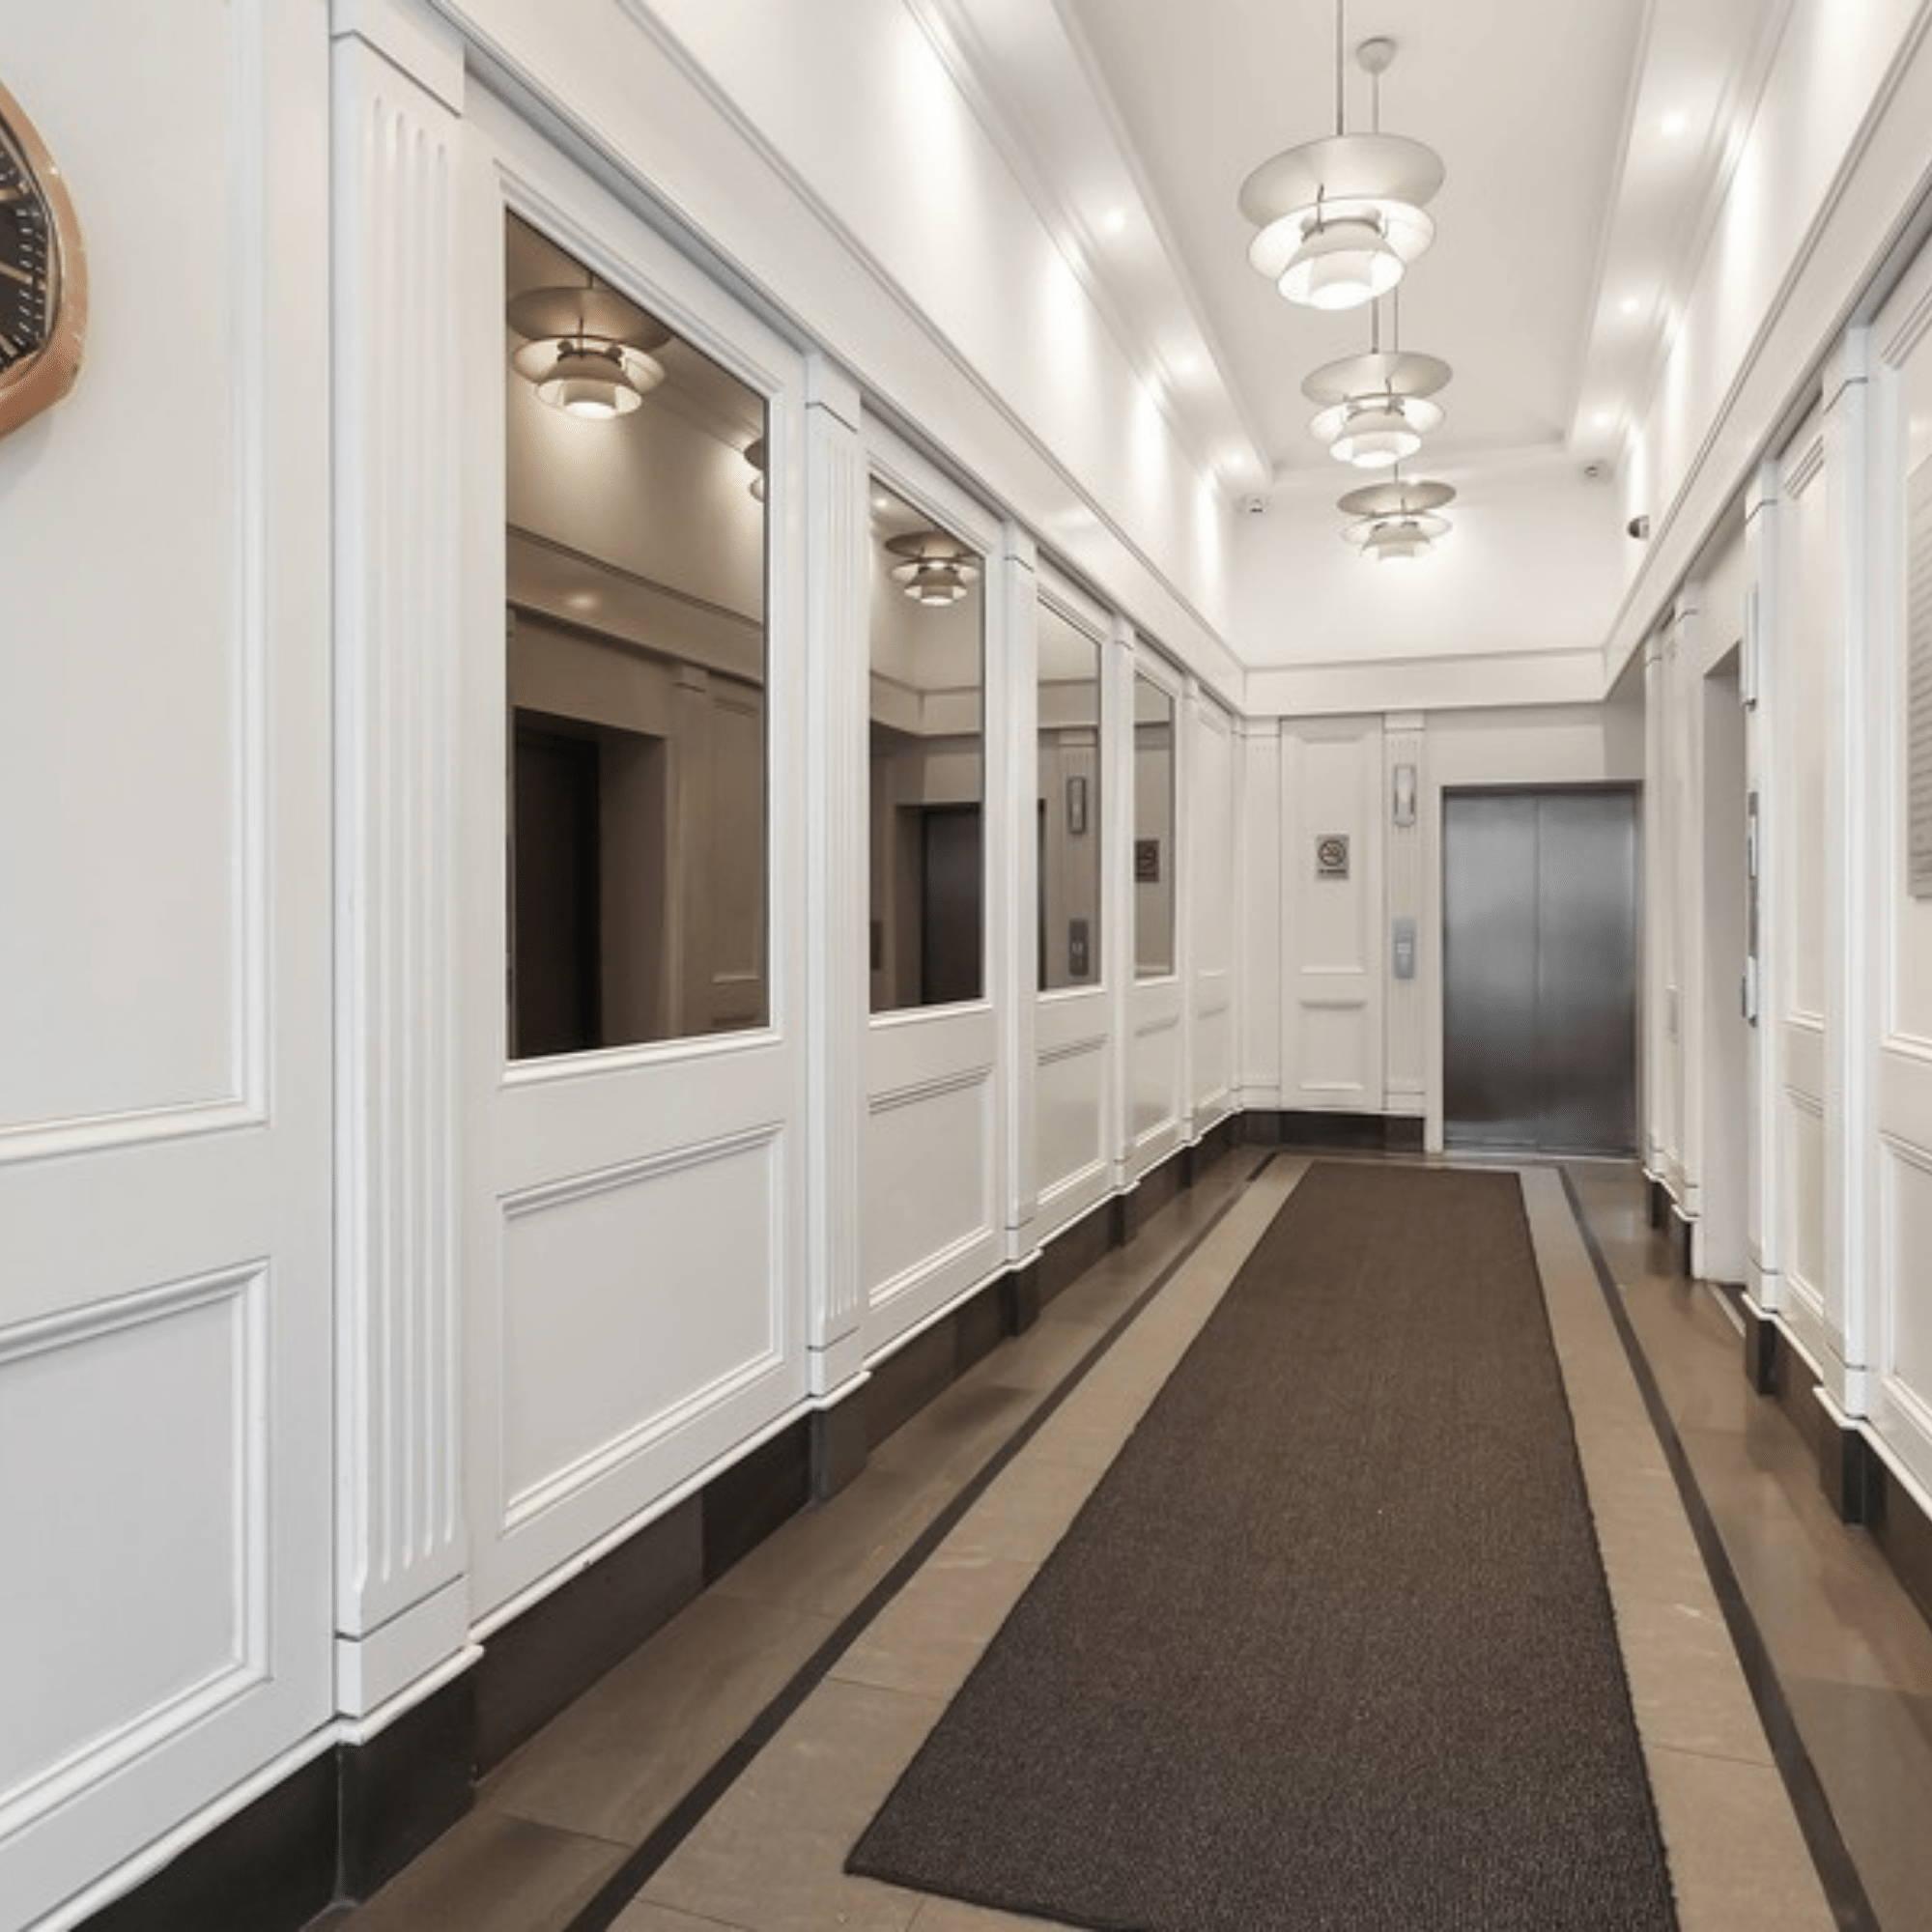 Hallway Entrance at our Australian Skin Clinic